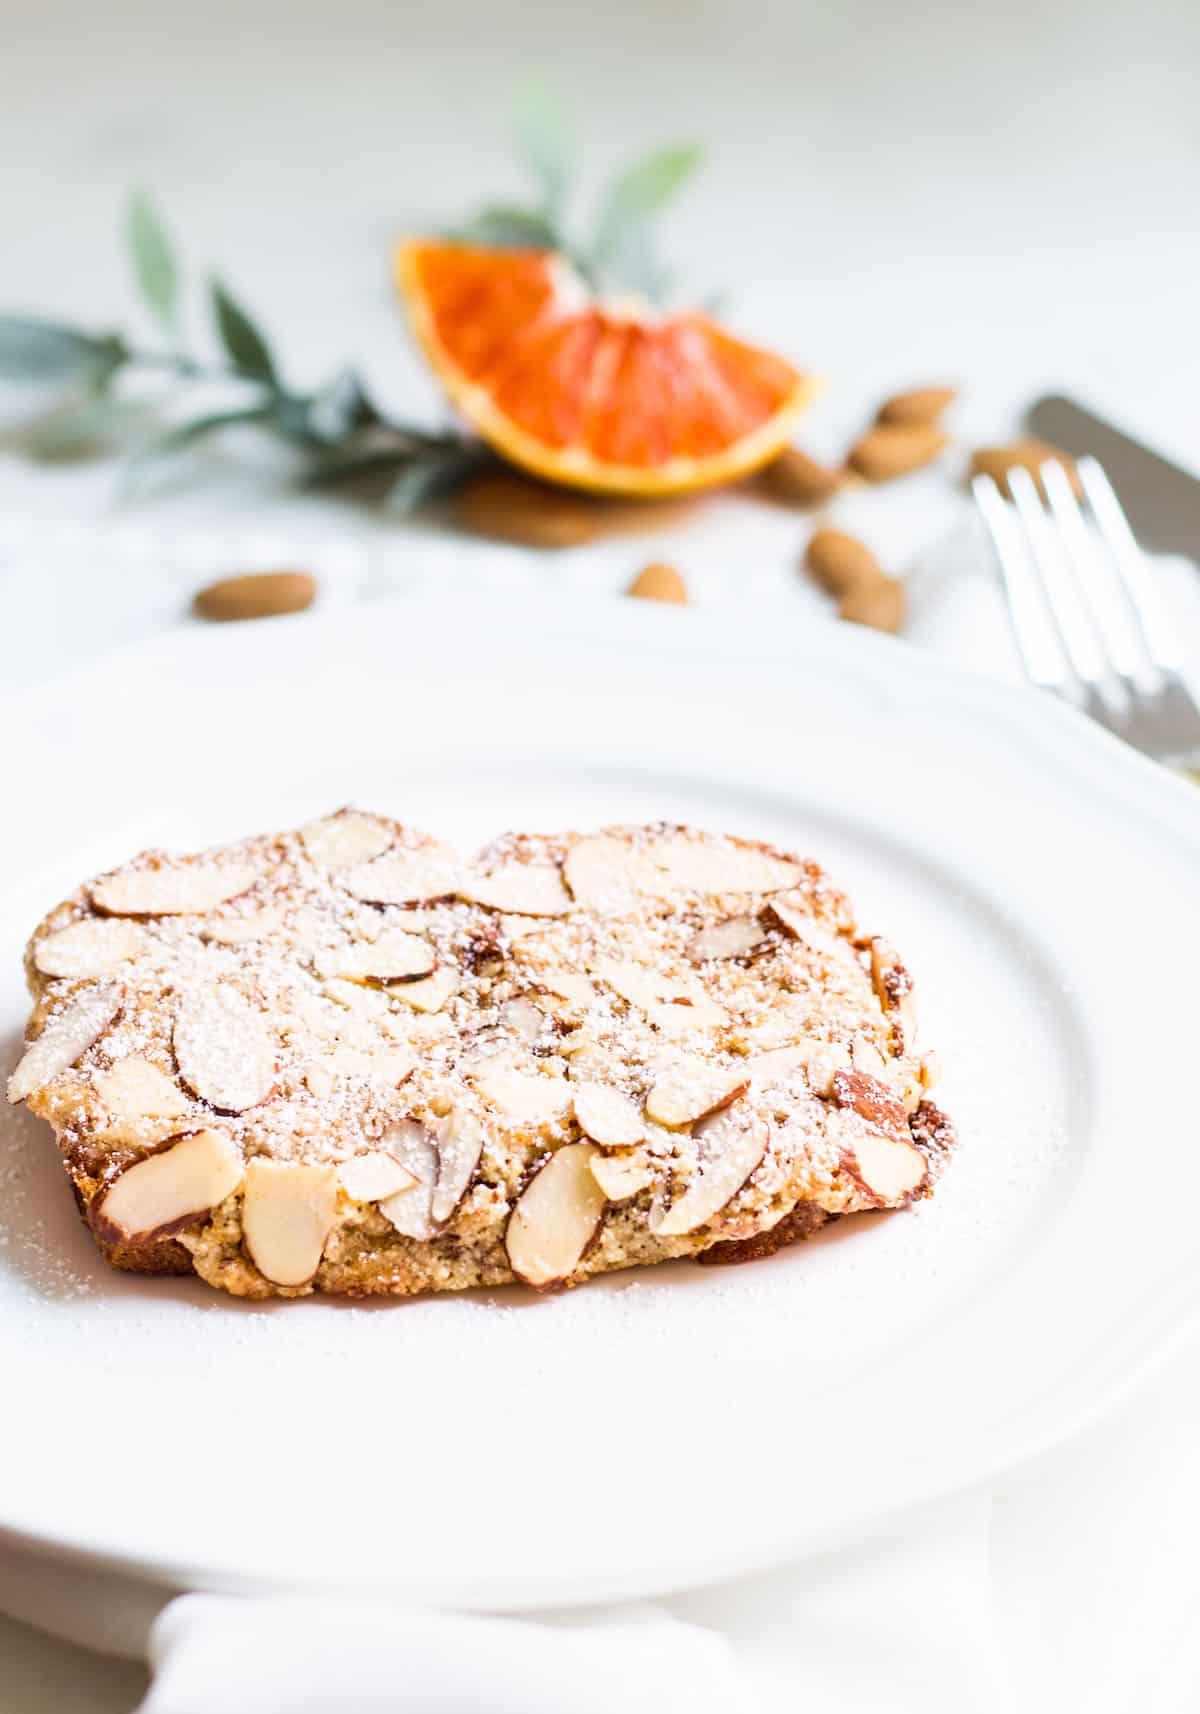 Bostock Pastry: baked brioche with almond cream. Perfect for breakfast or dessert; recipe via MonPetitFour.com